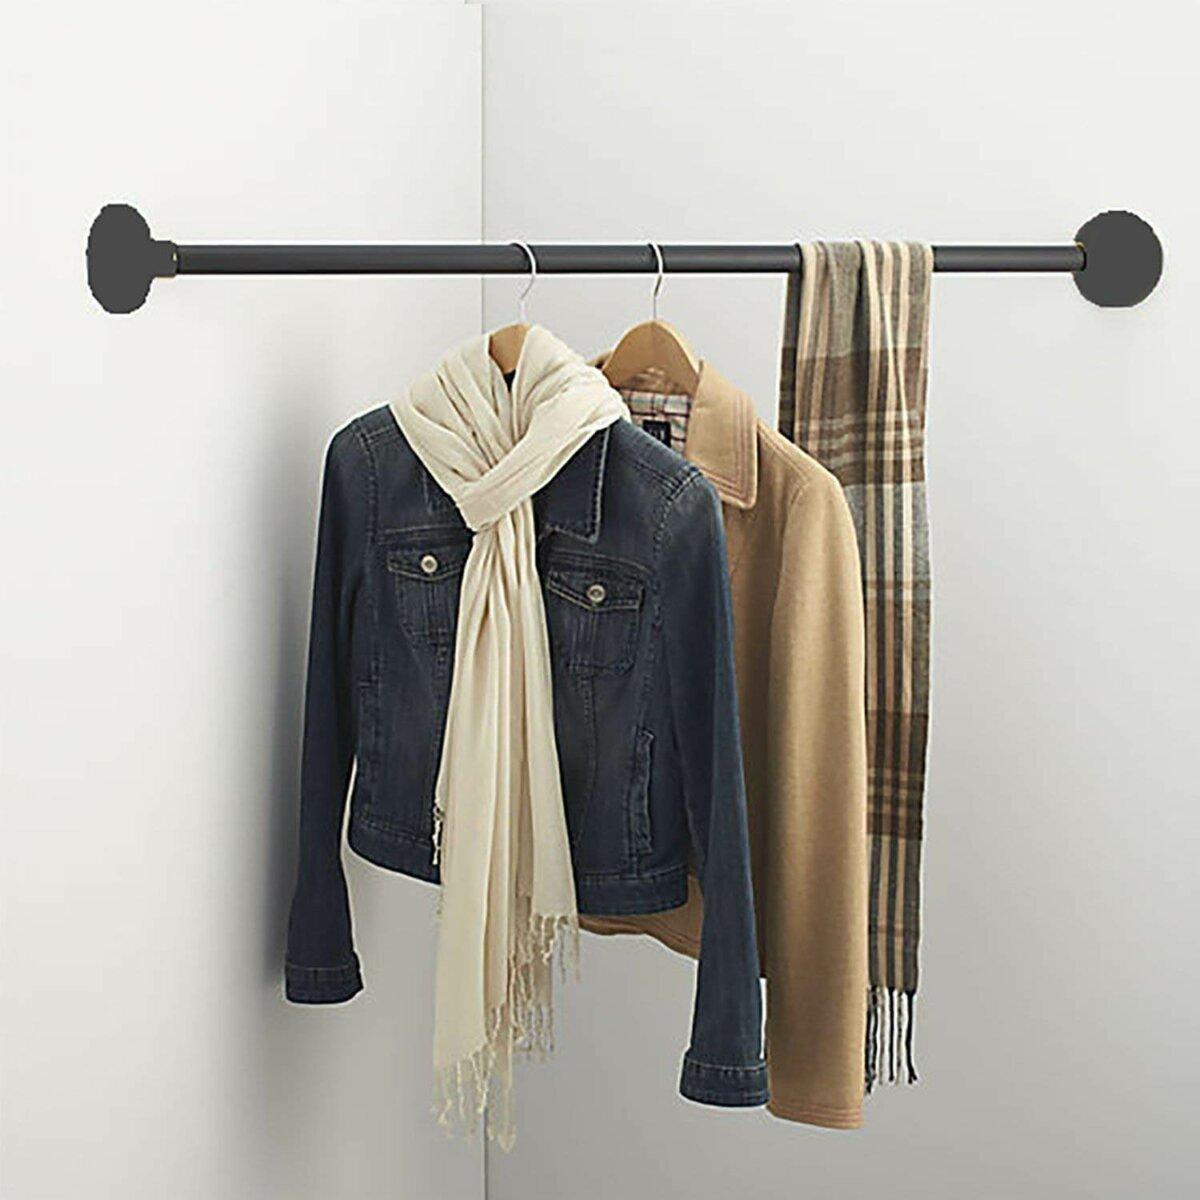 corner bar for clothing storage